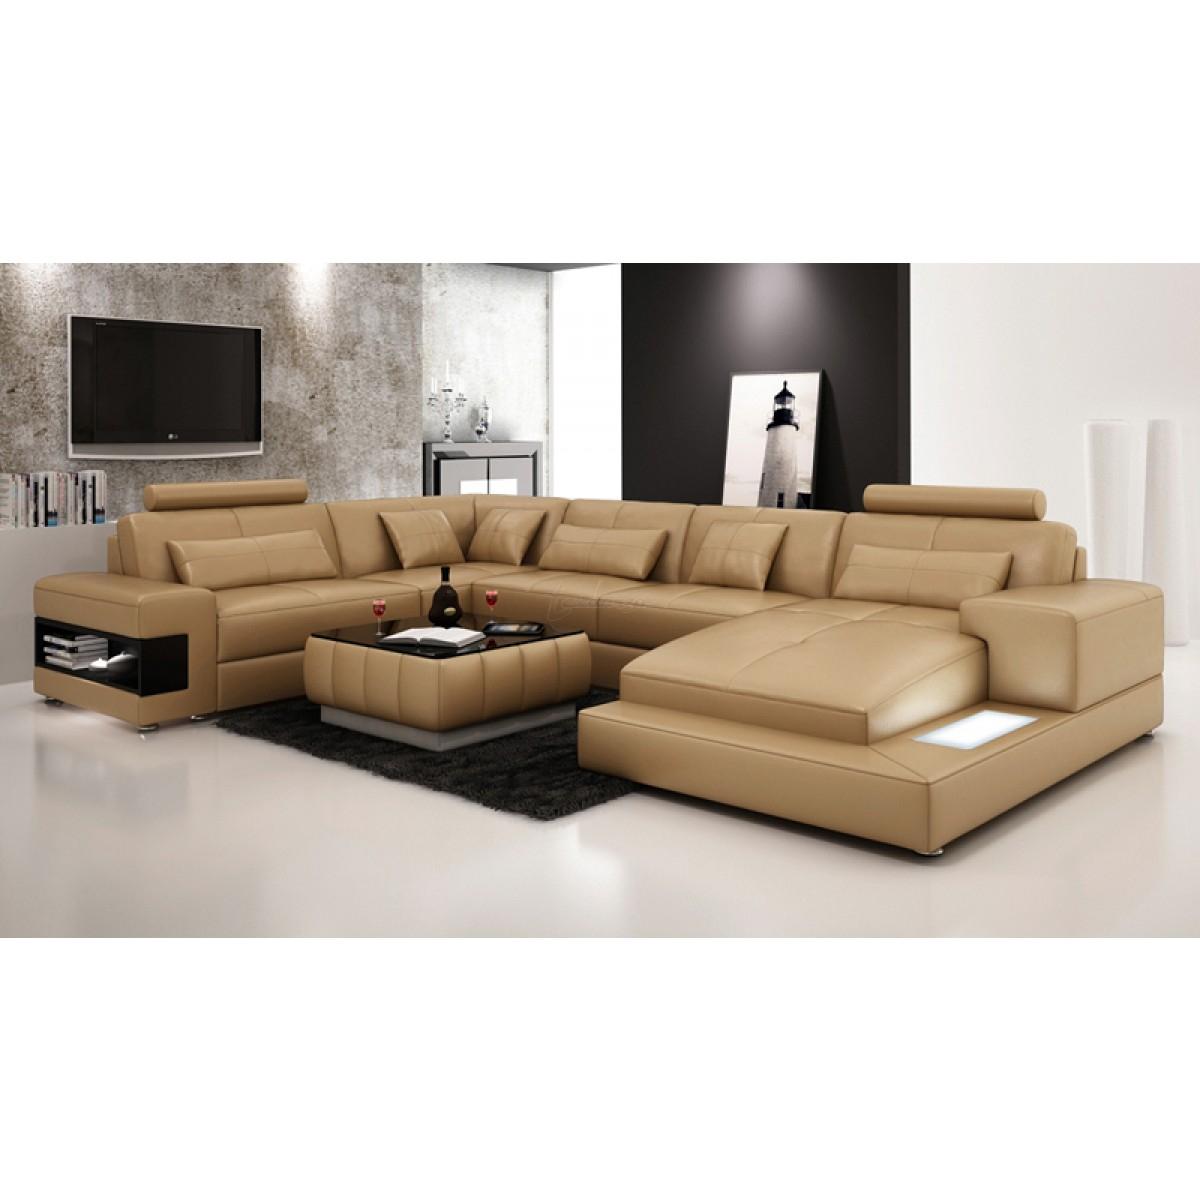 Grand canapé d angle design contemporain CAMARO XL 2 350 00